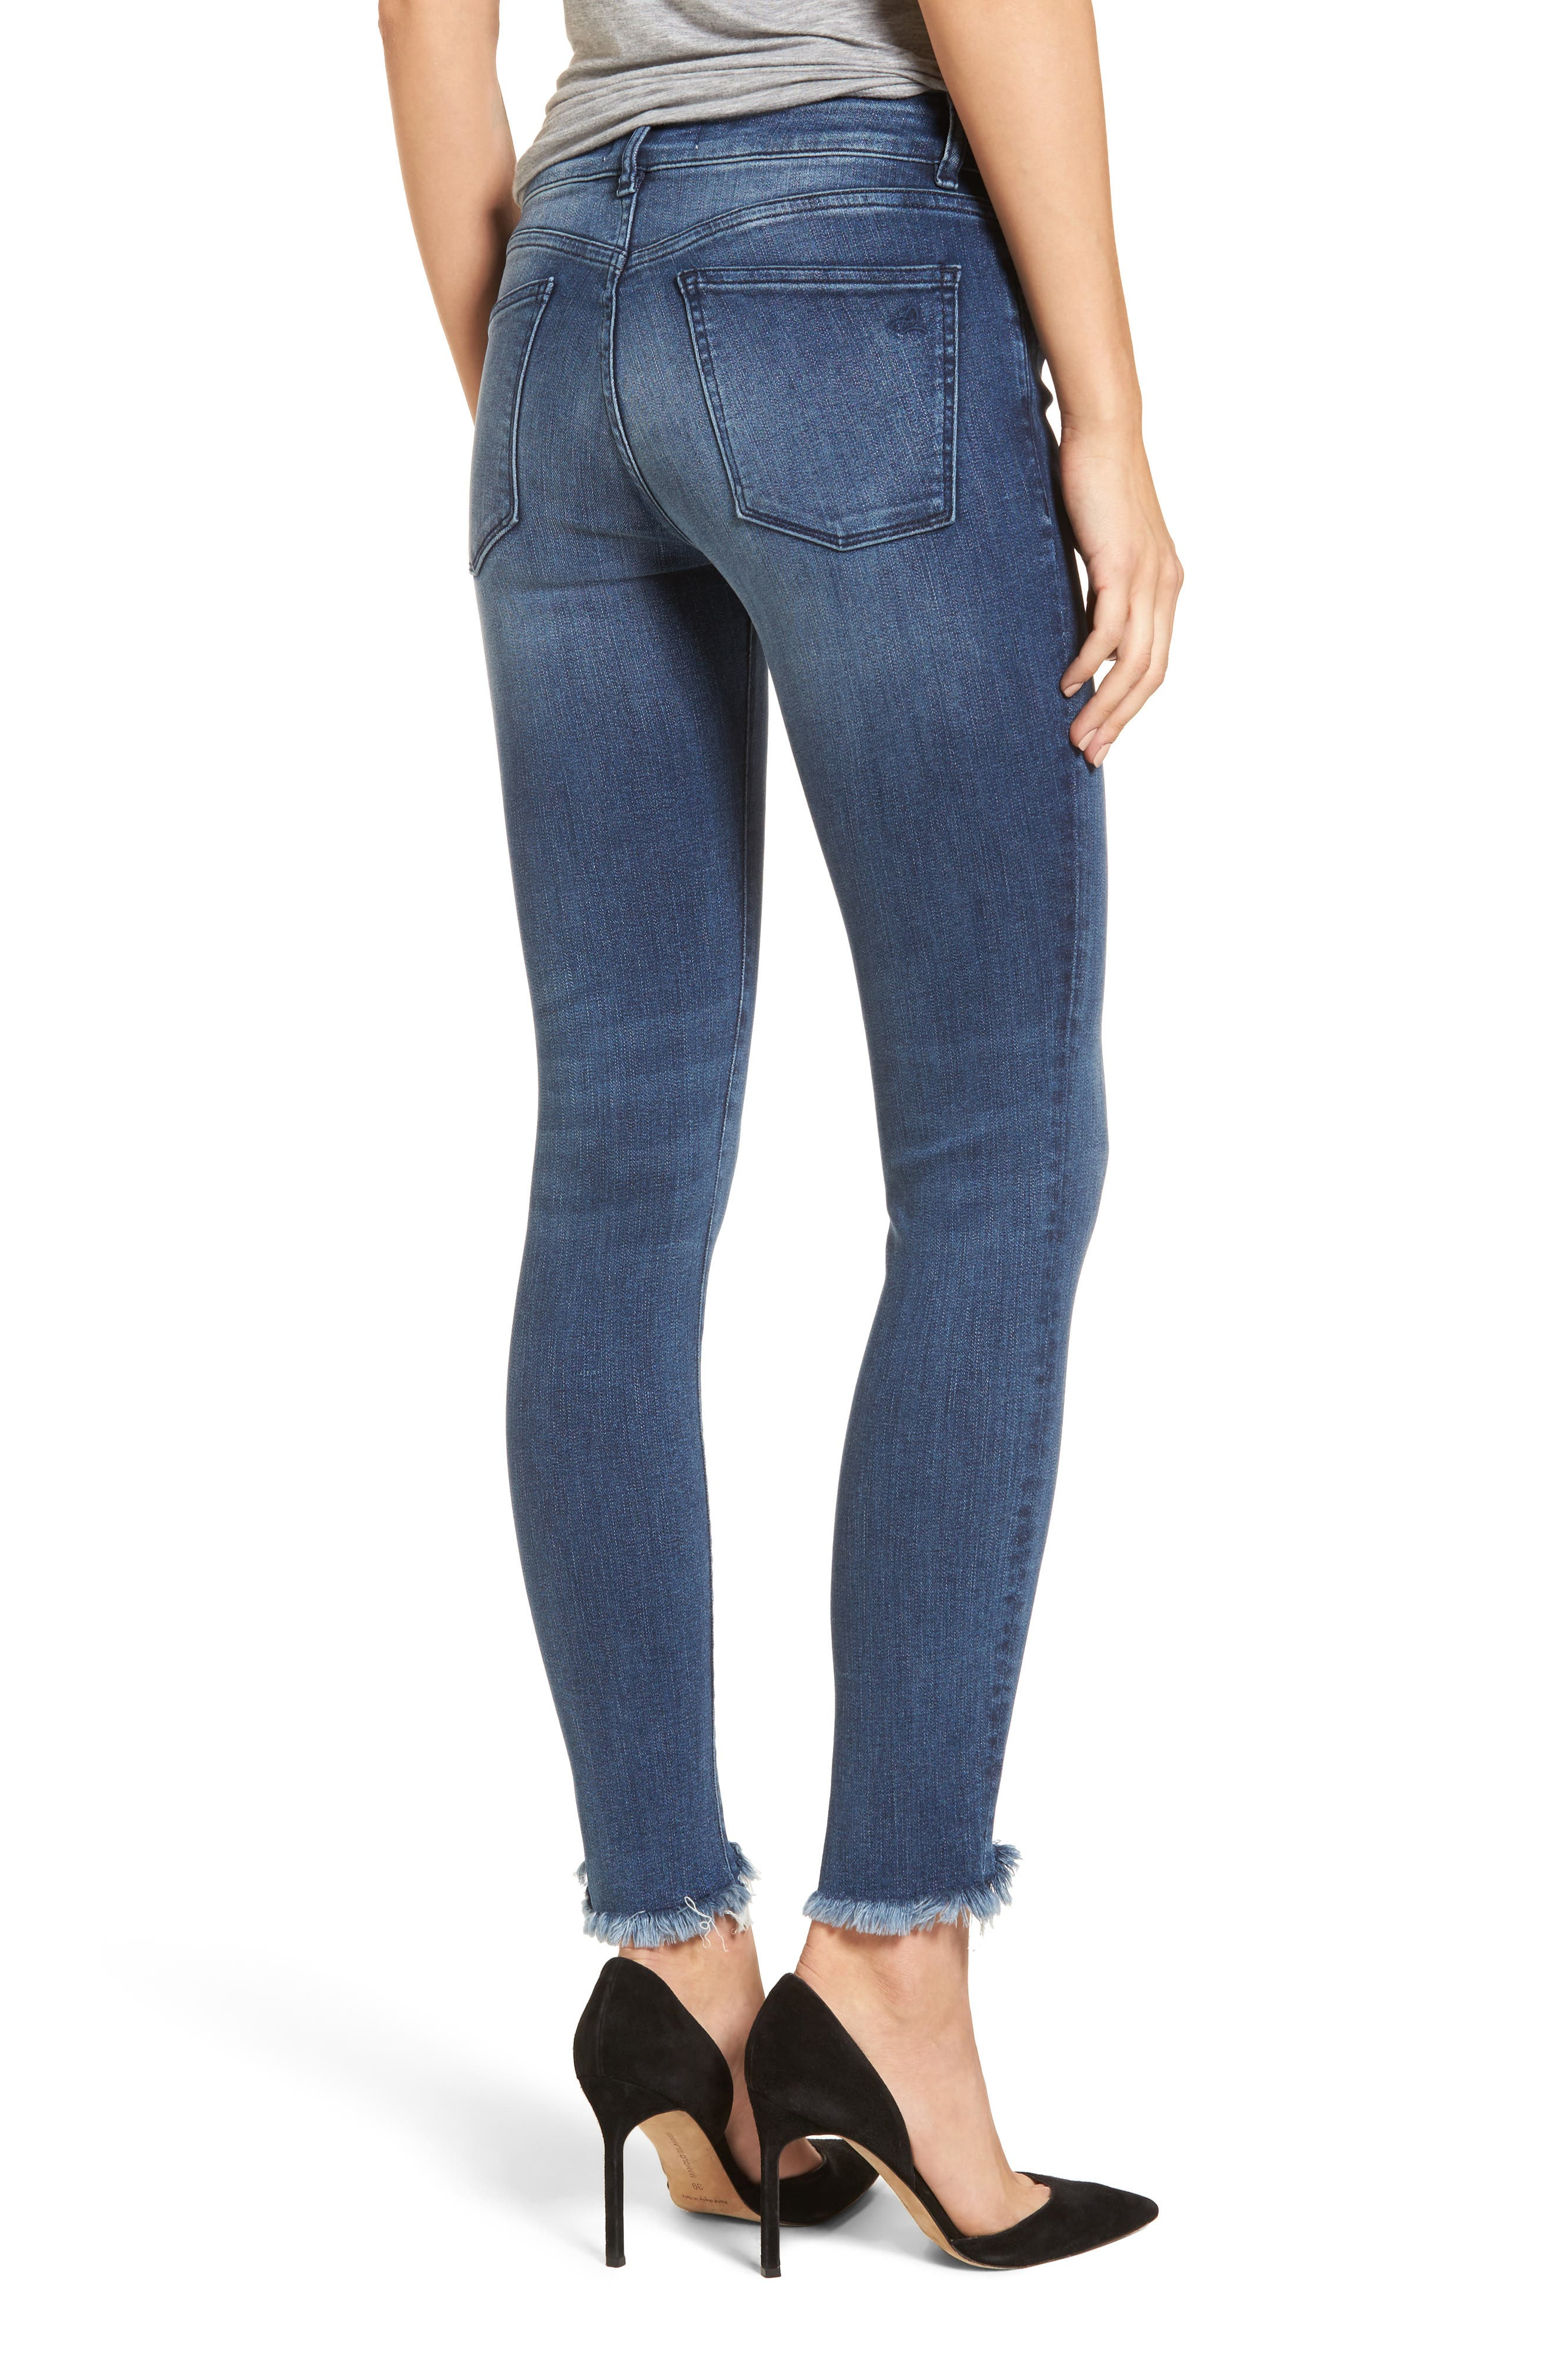 Emma Power Legging Jeans,                             Alternate thumbnail 2, color,                             425